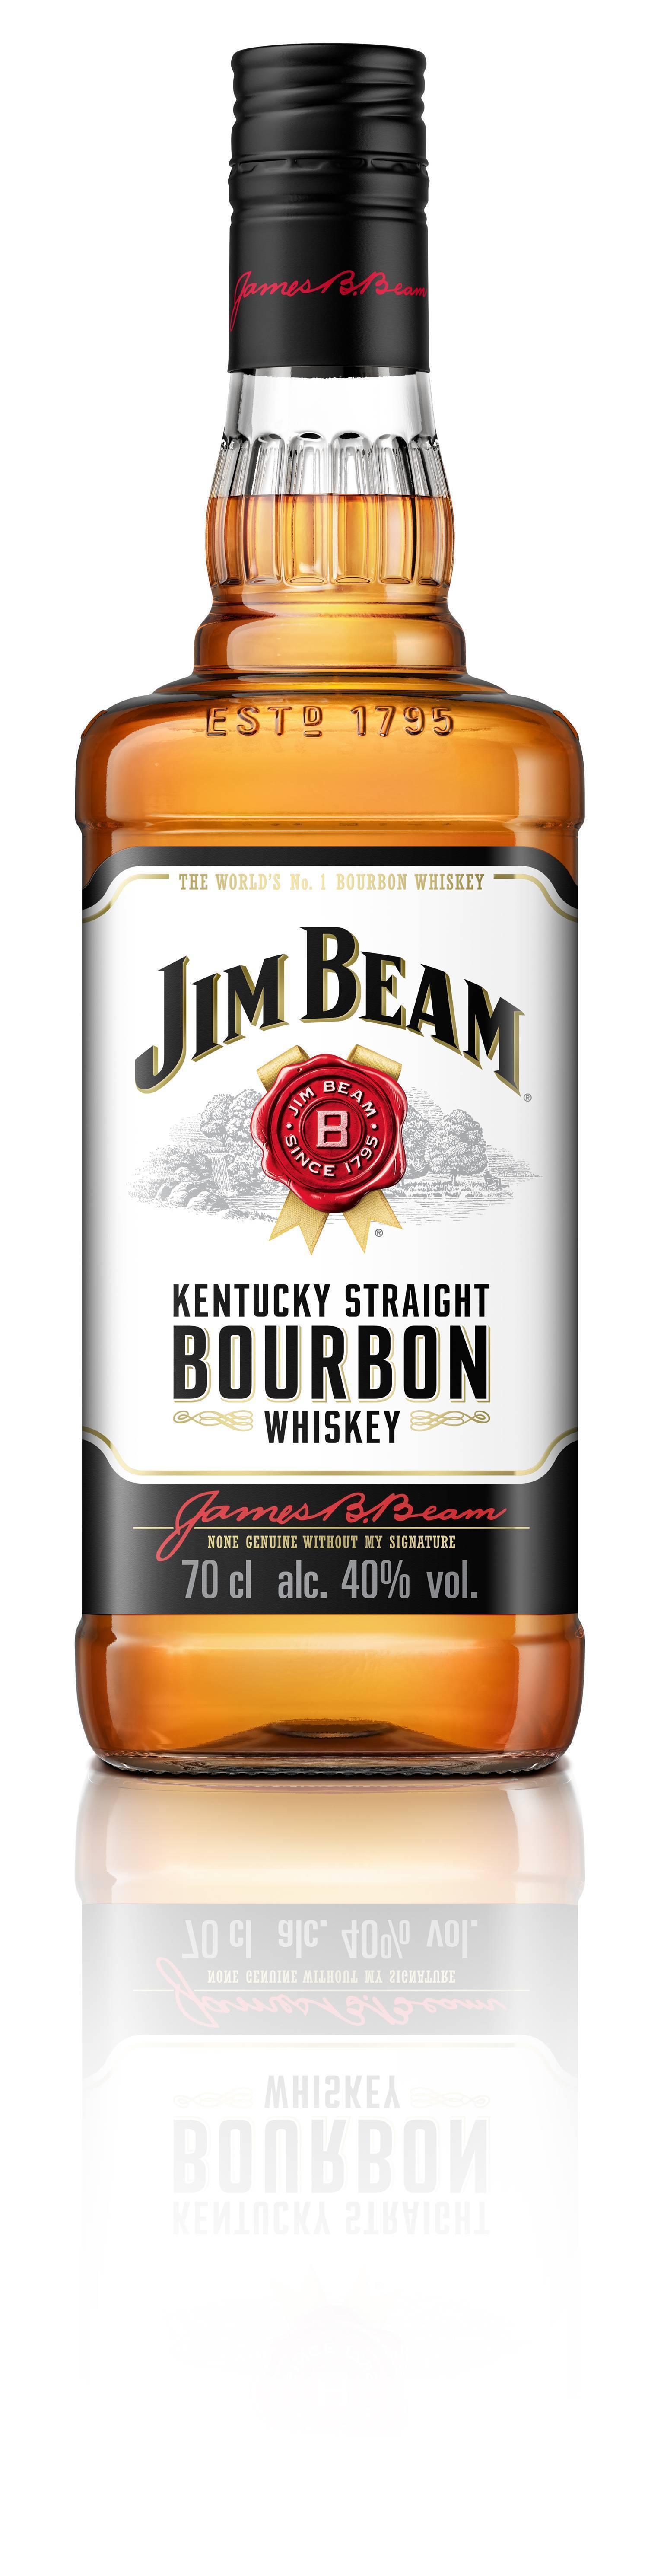 Бурбон jim beam (джим бим) — знакомство с напитком